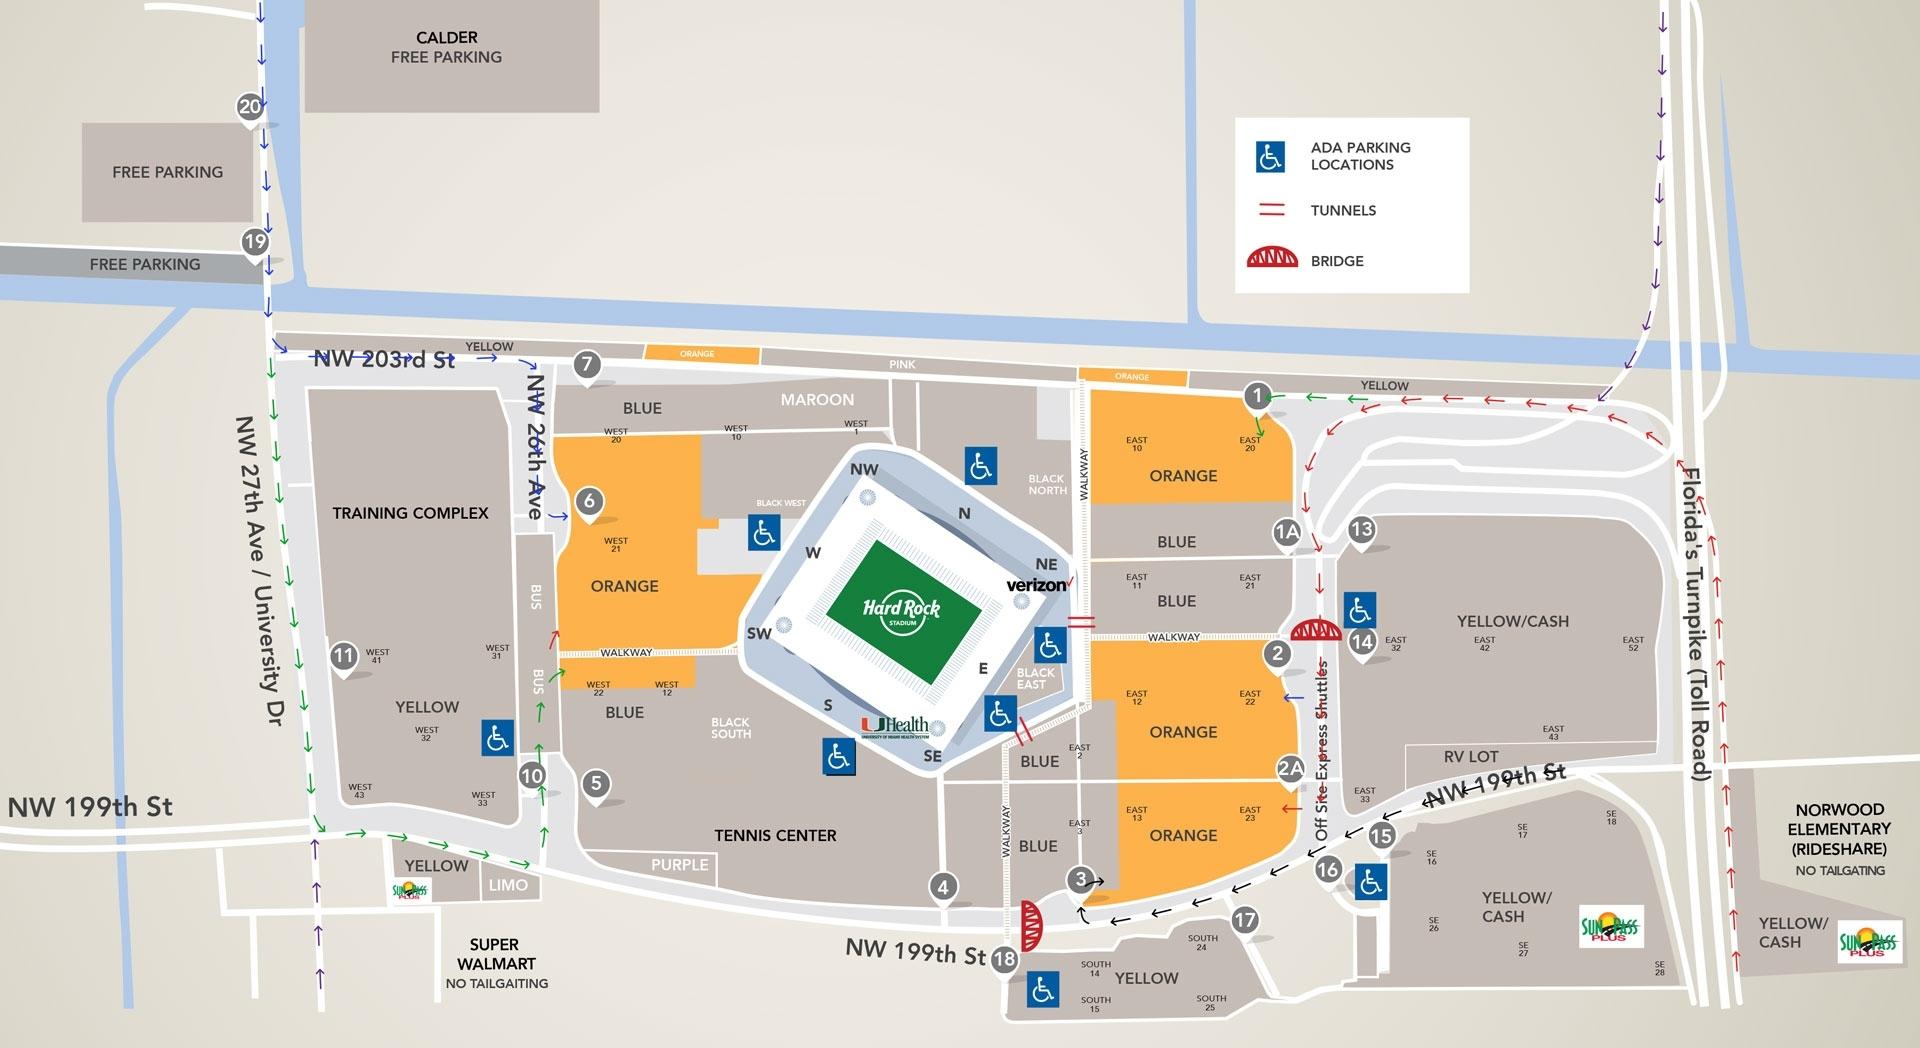 Parking_Directions Orange Parking - Hard Rock Stadium for Super Bowl Parking Map